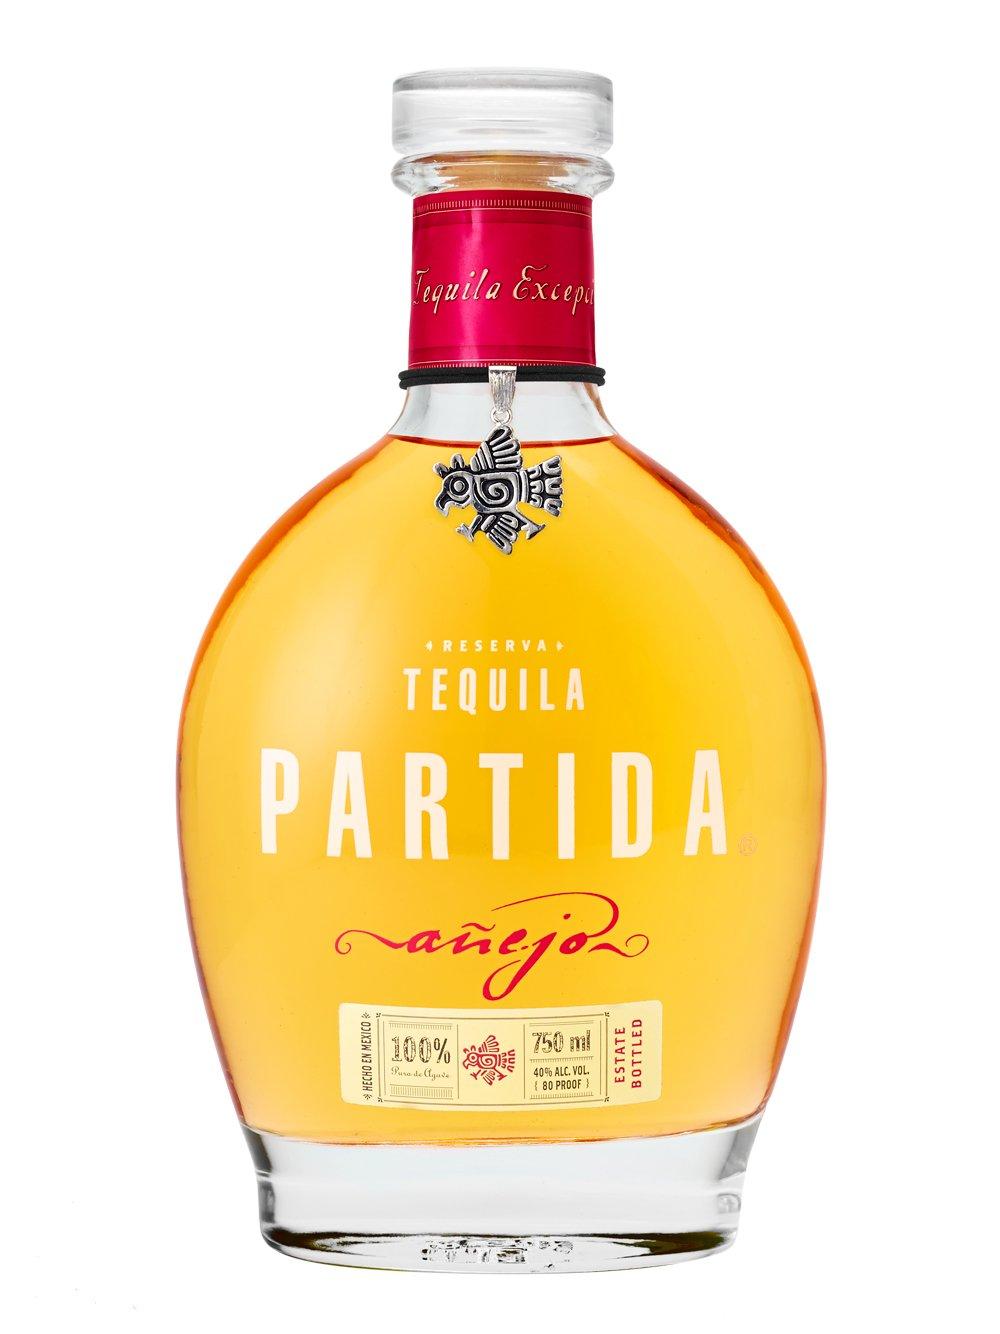 Partida Tequila Anejo (2019)